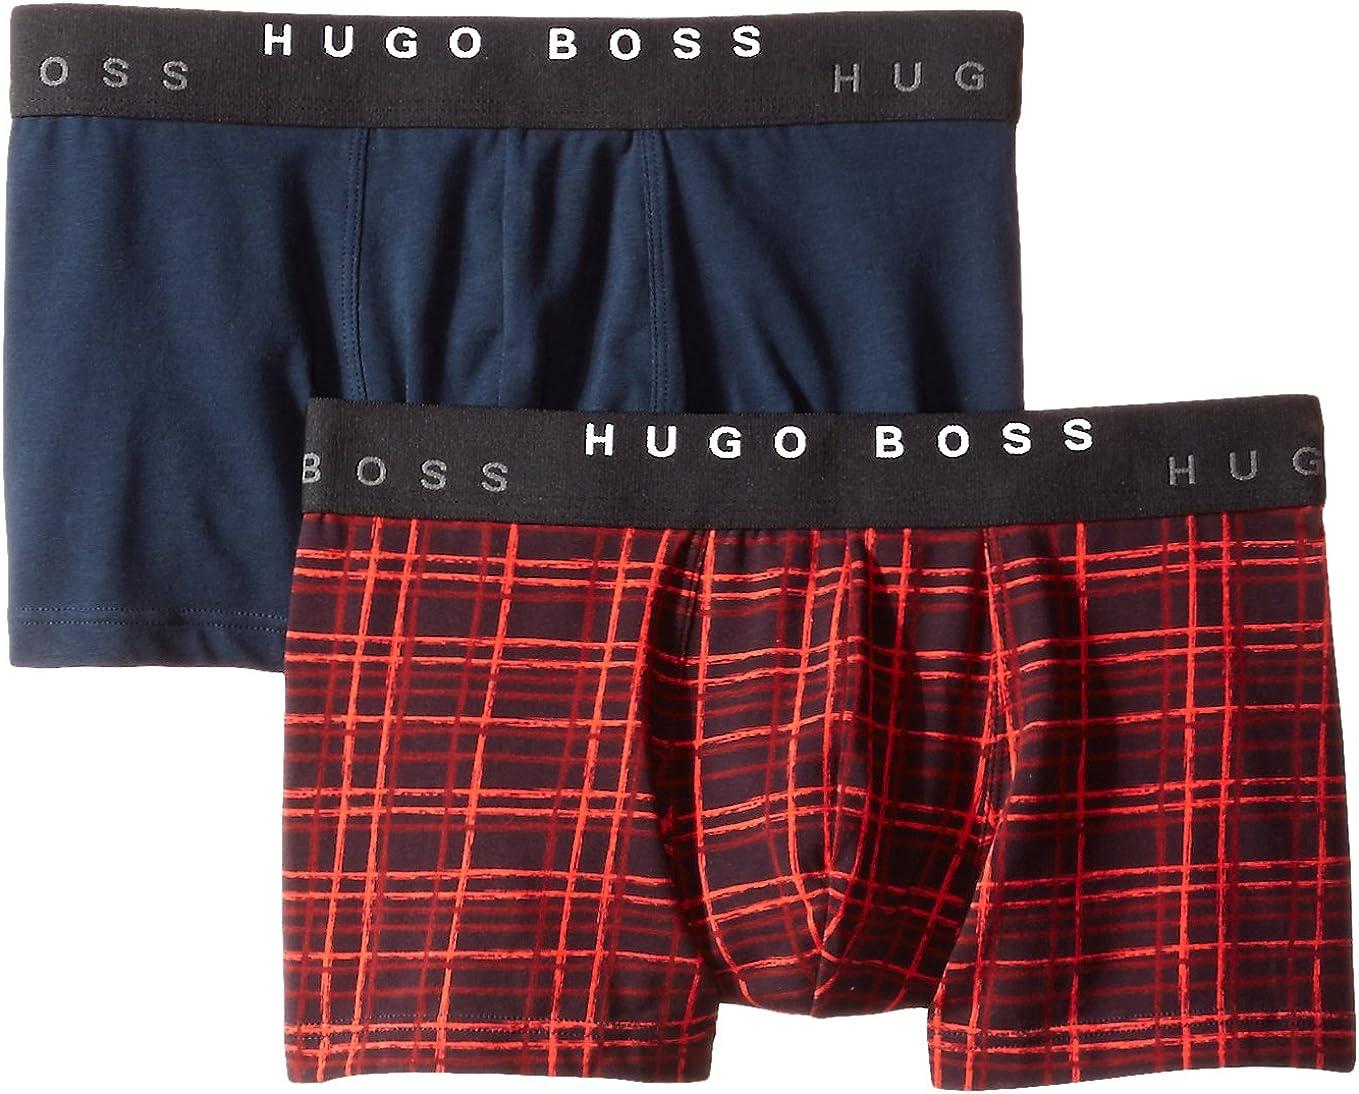 BOSS HUGO BOSS Men's 2-Pack Cotton Stretch Boxer Brief